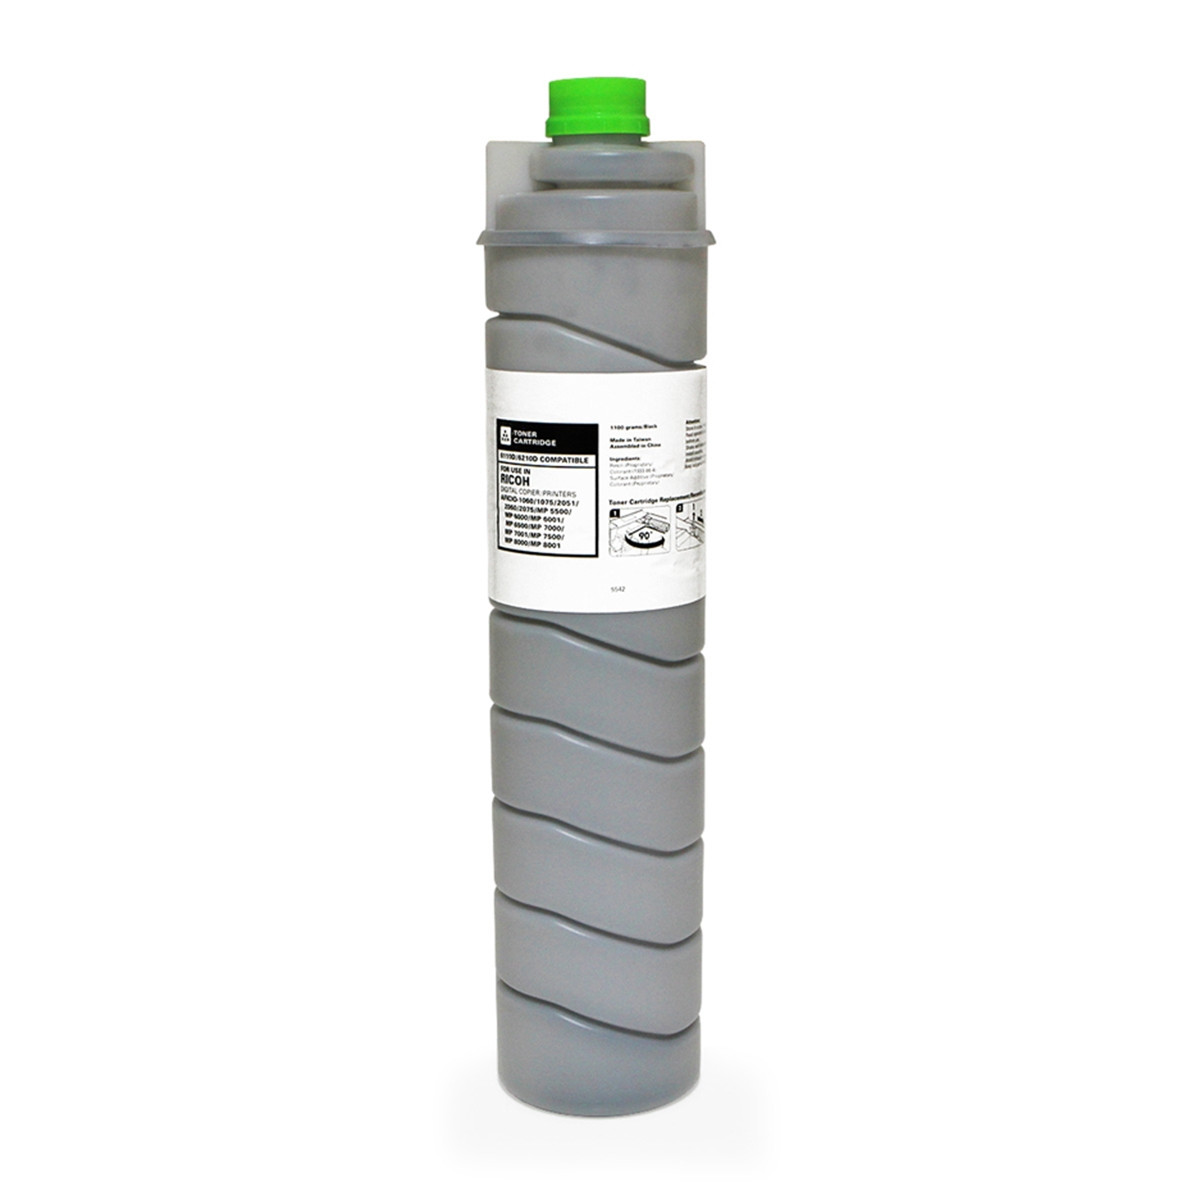 Toner Ricoh 1060 1075 | 6110D 6210D | Katun Performance 1.100kg